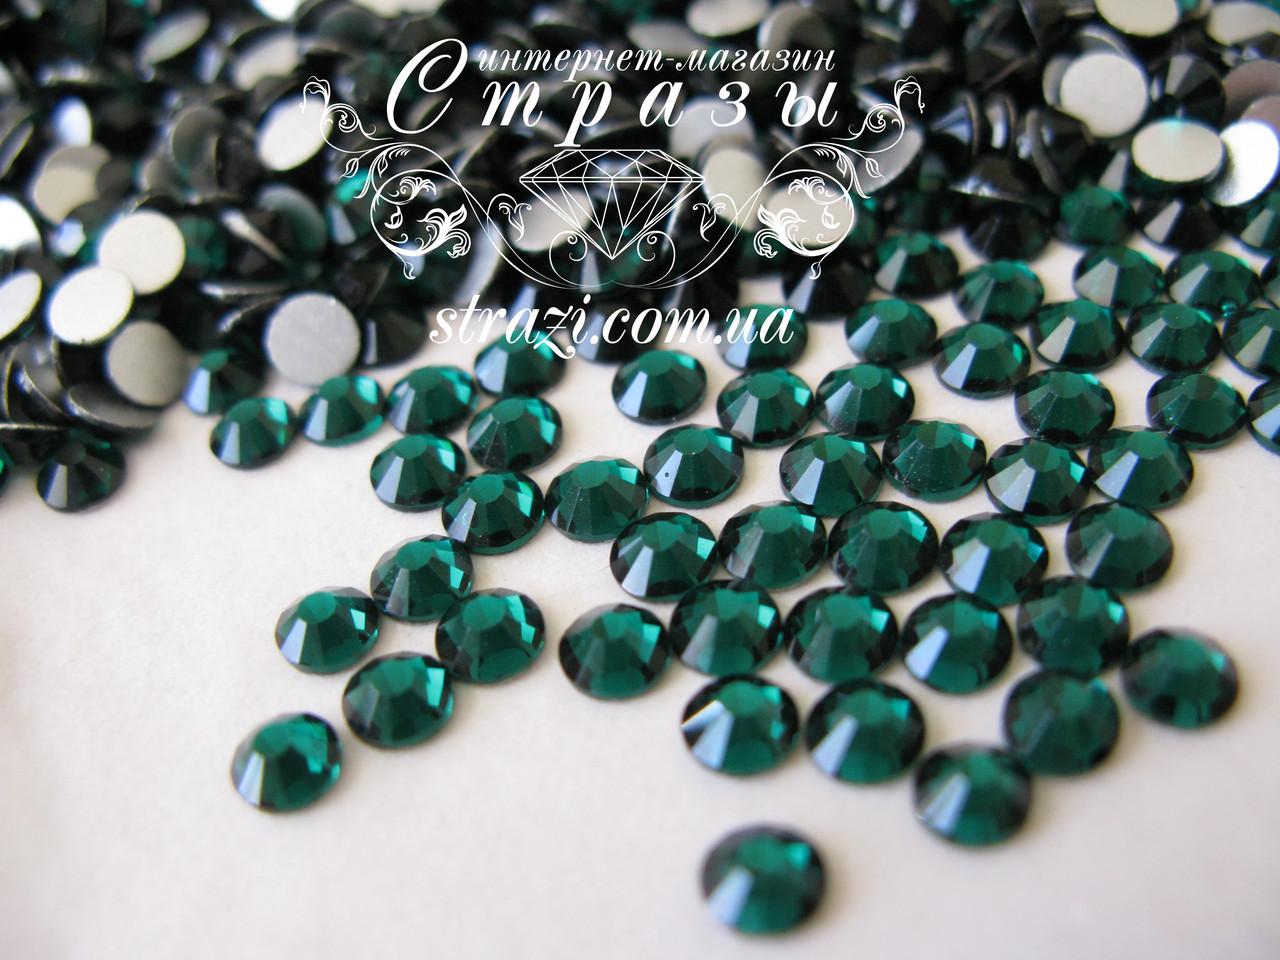 Стразы ss20 Emerald, 1440шт, (4,6-4,8мм)